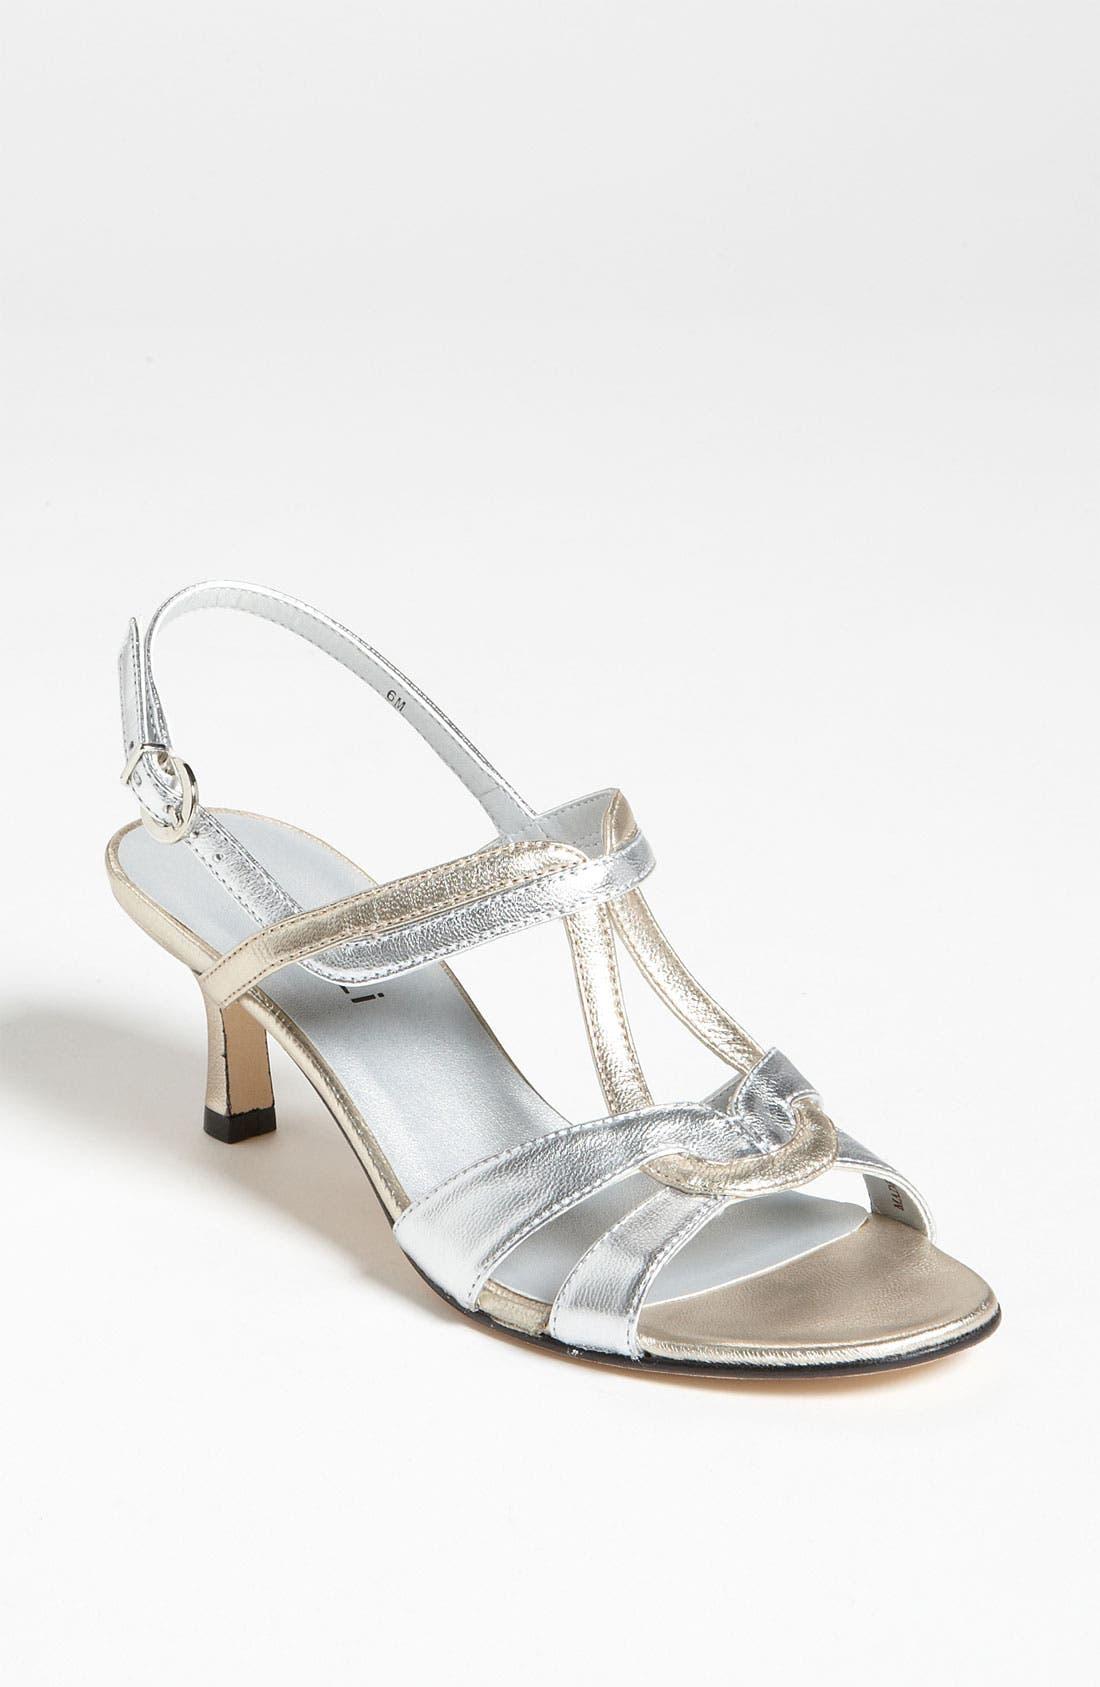 Alternate Image 1 Selected - VANELi 'Mathea' Sandal